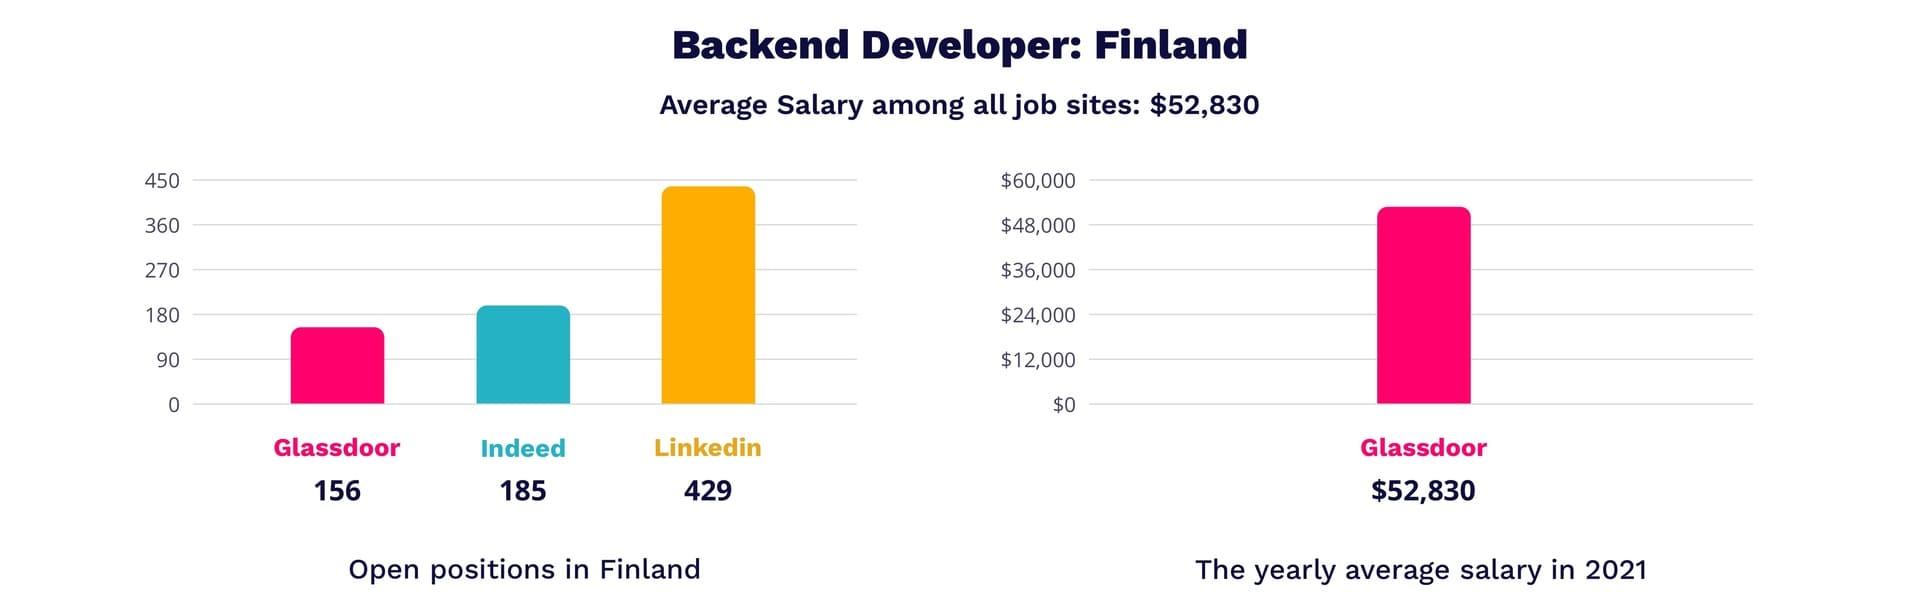 Backend developer salary in Finland